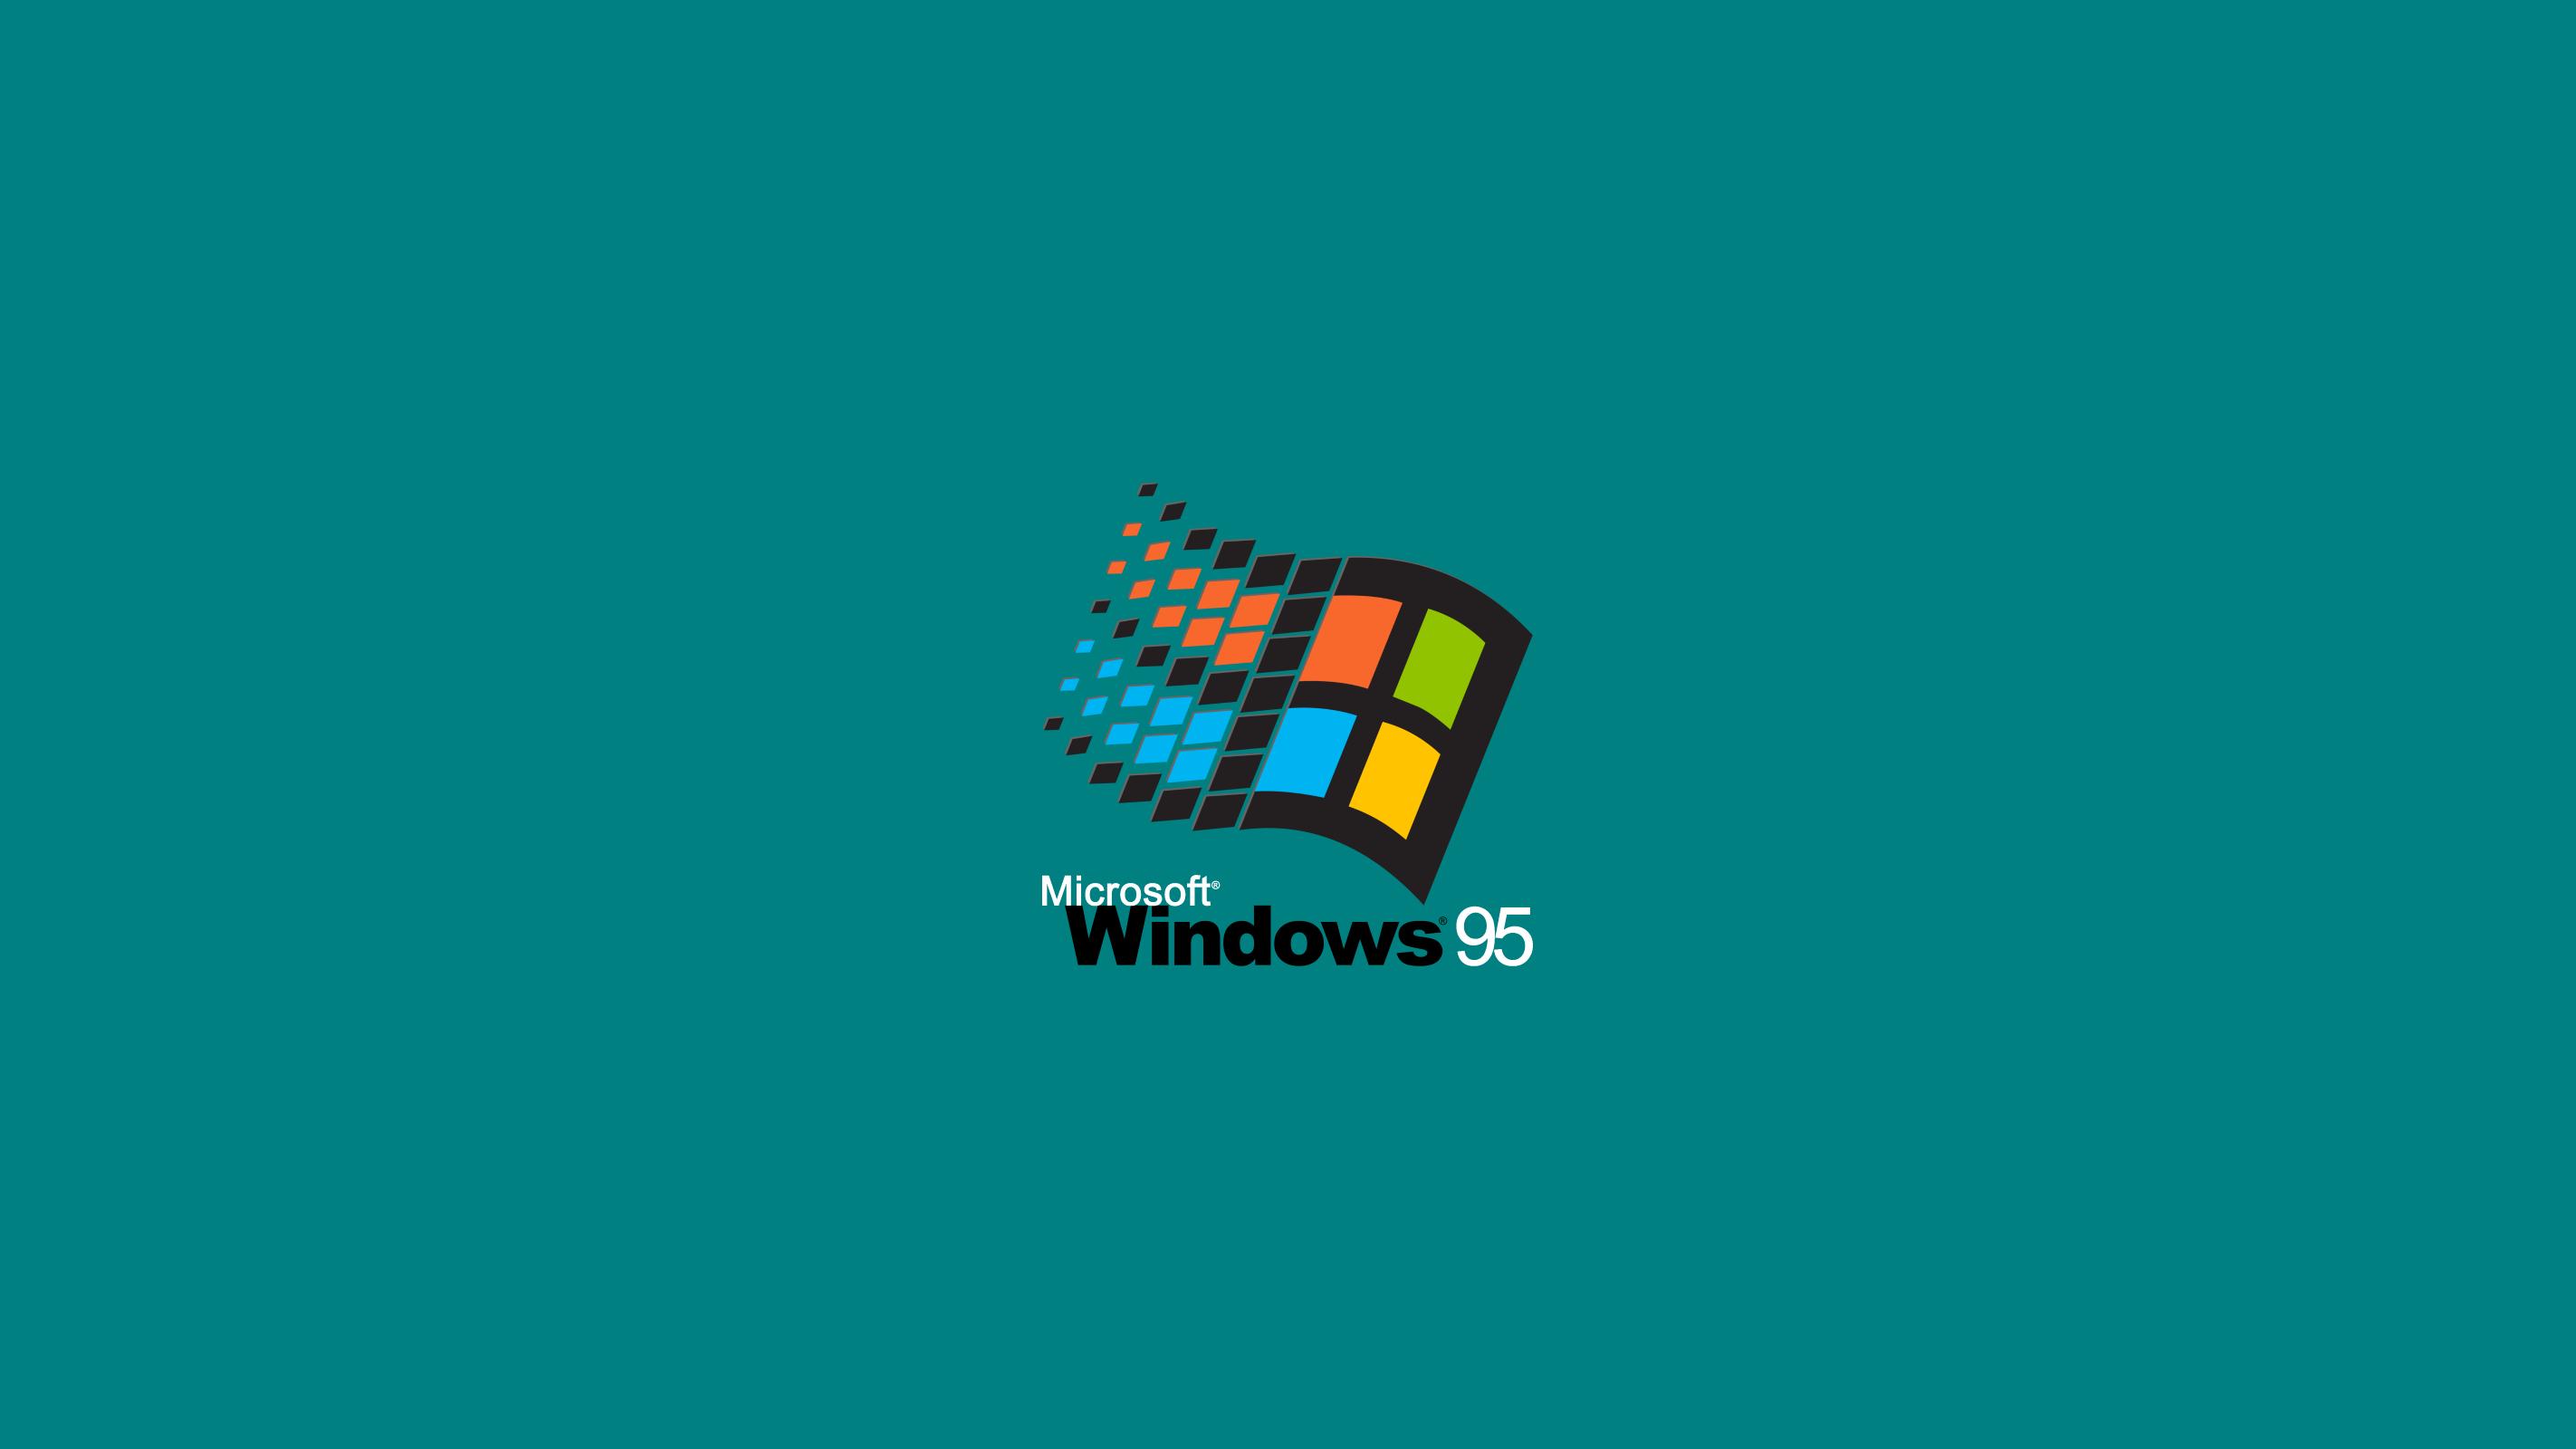 General 2845x1600 Windows 95 Microsoft Windows logo digital art